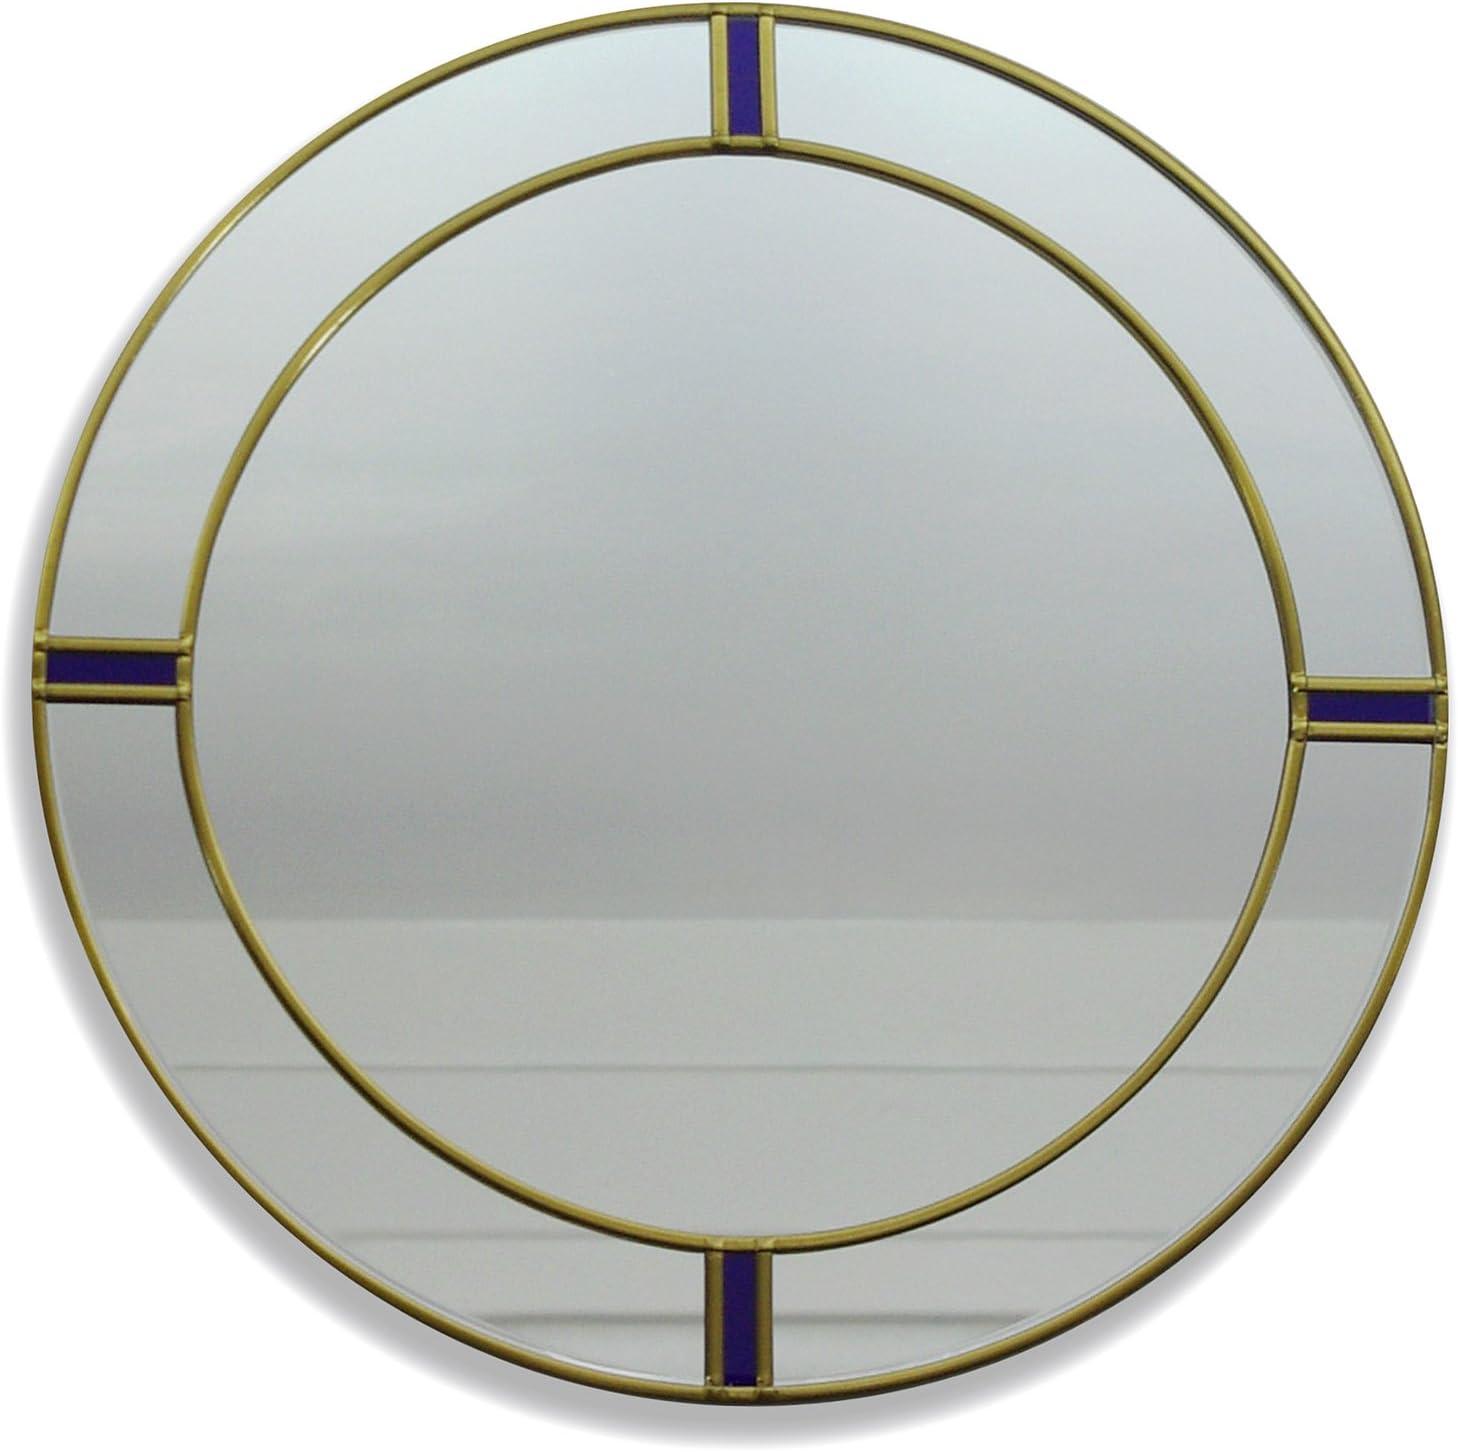 Berlin Art Deco Style Round Large Wall Mirror 40cm Diameter Amazon Co Uk Beauty